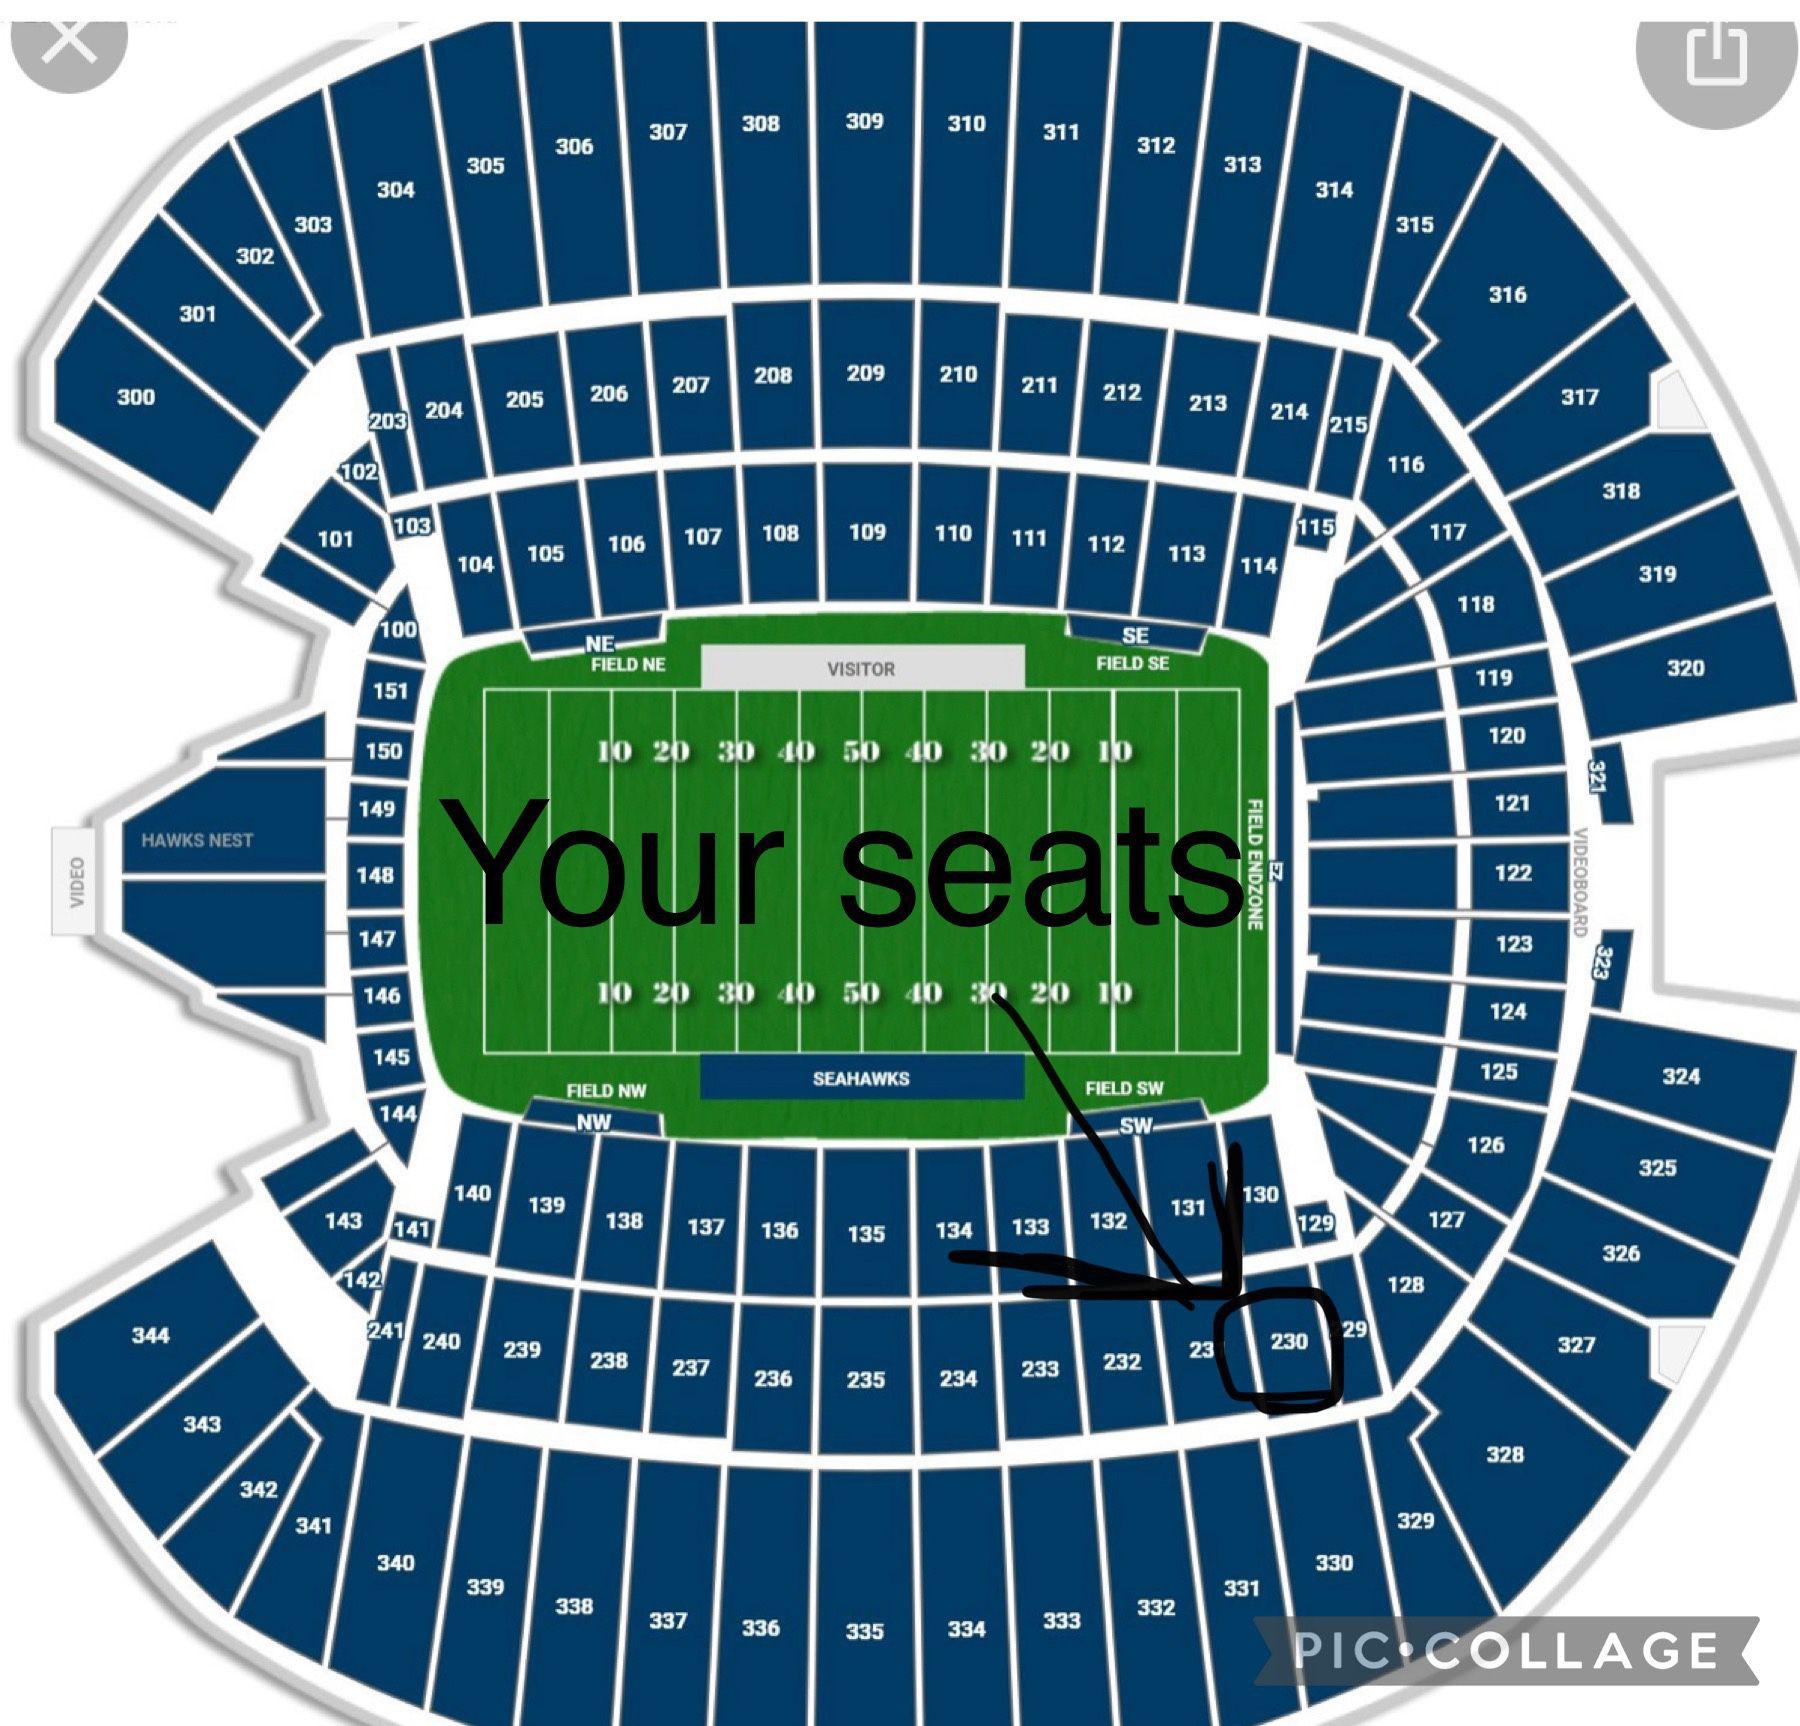 Seahawks Vs Titans Tickets - Home Opener - 200 Level Seats!!